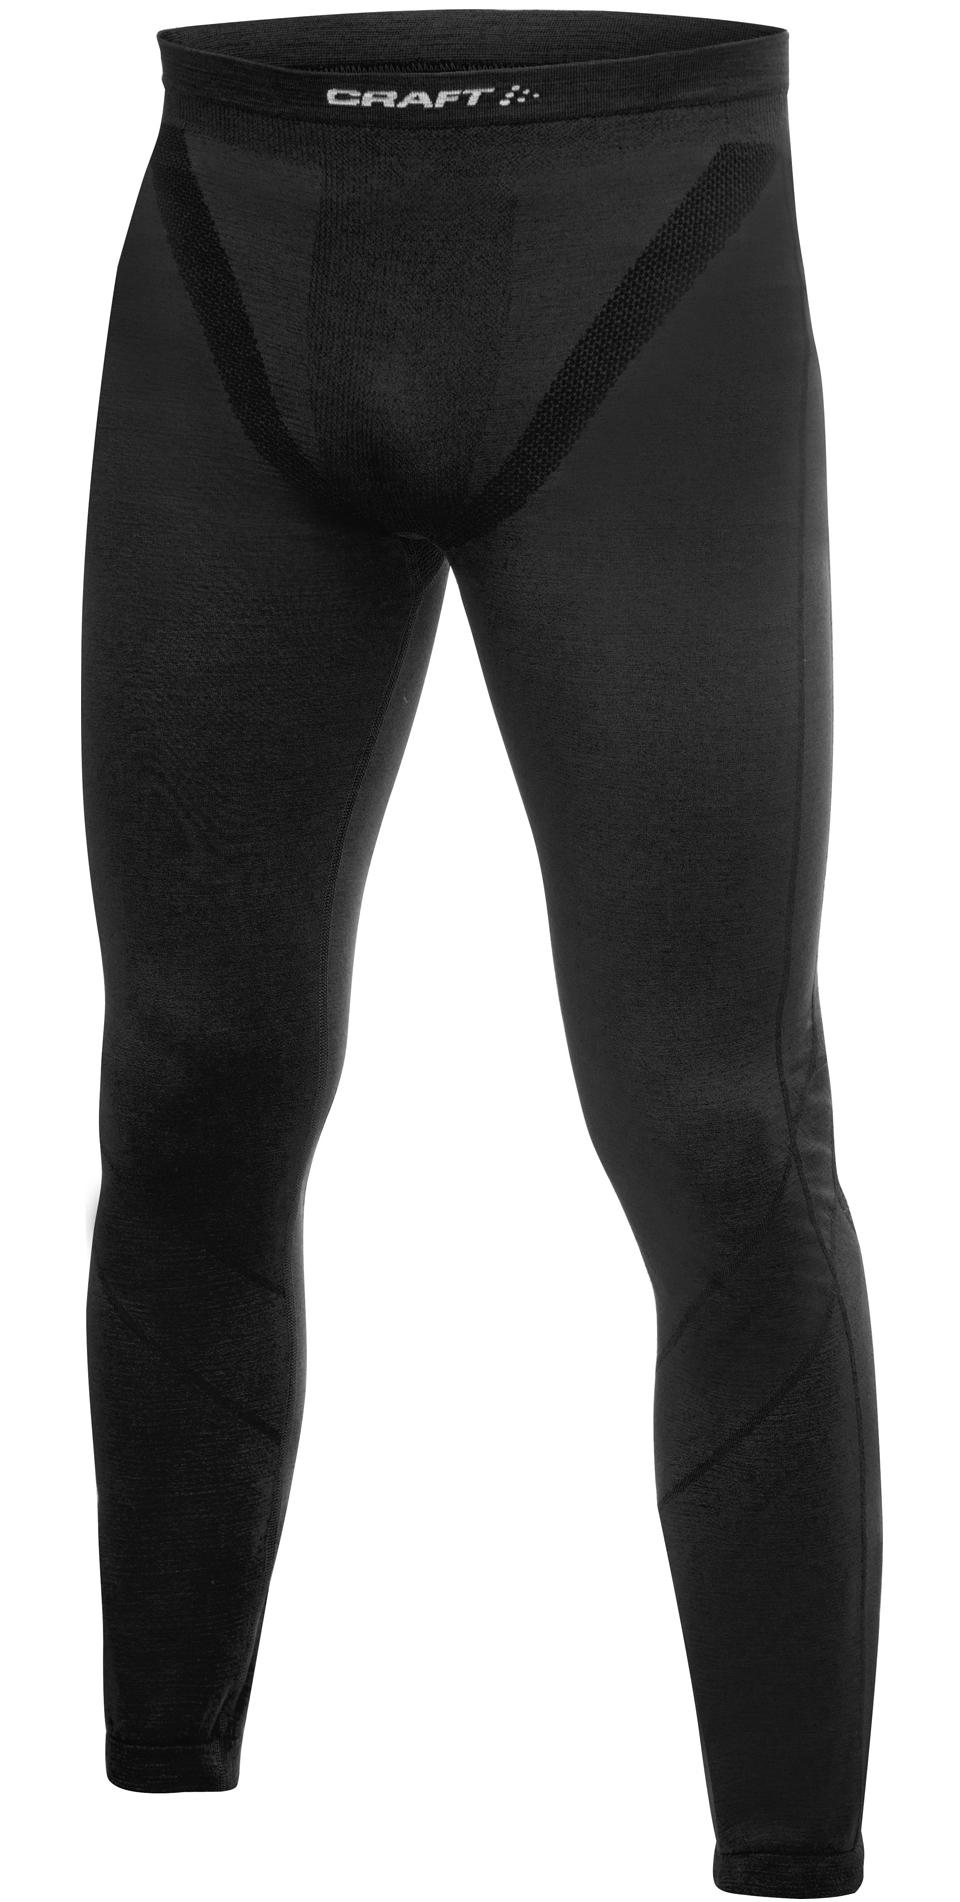 craft pantalon pluie performance vlo noir catgorie bermudas shorts femmes. Black Bedroom Furniture Sets. Home Design Ideas